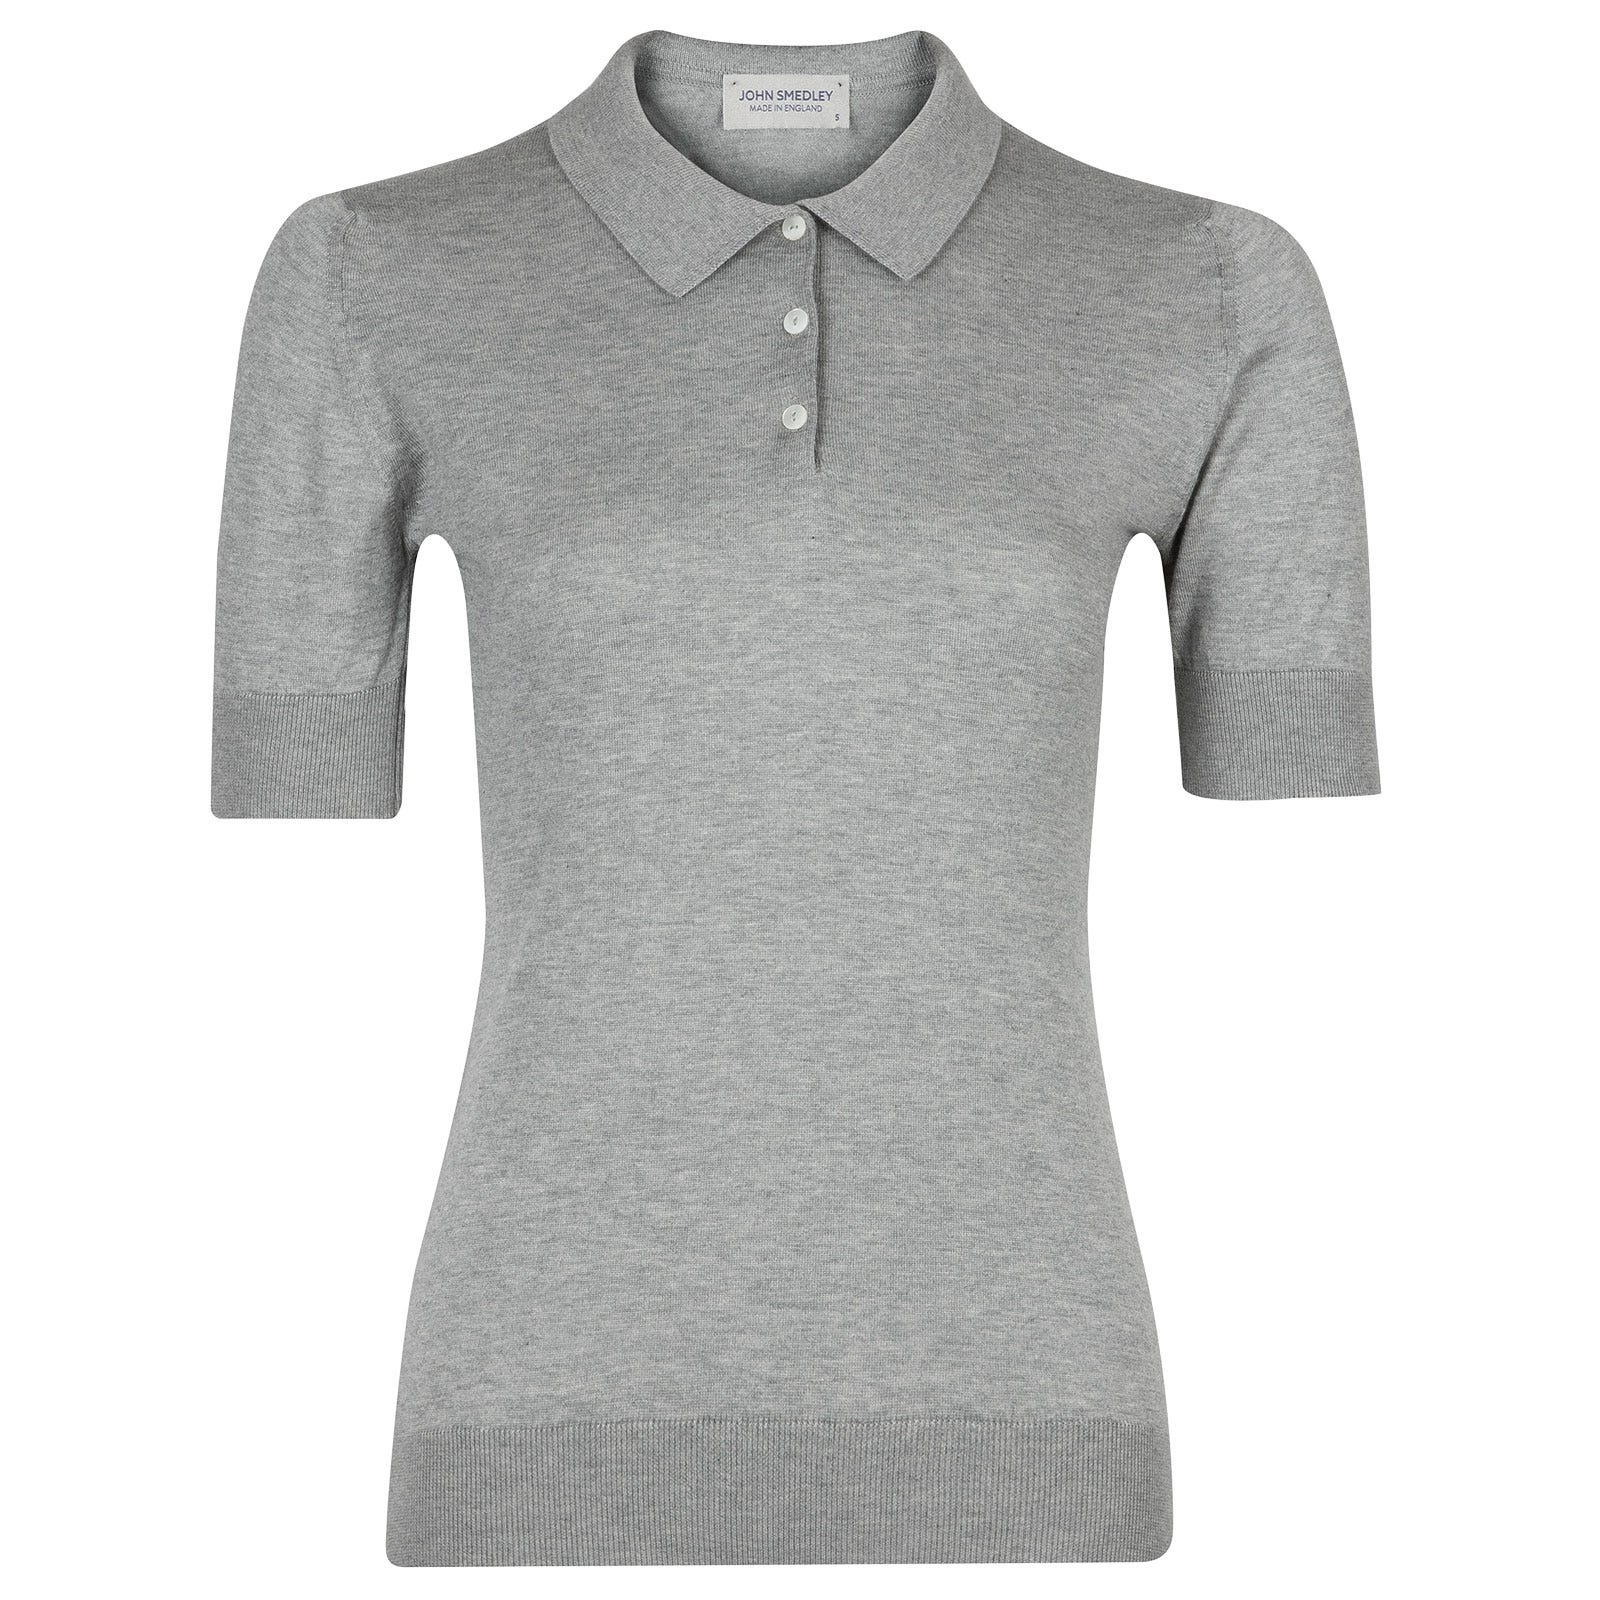 John Smedley Picnic in Silver Shirt-MED